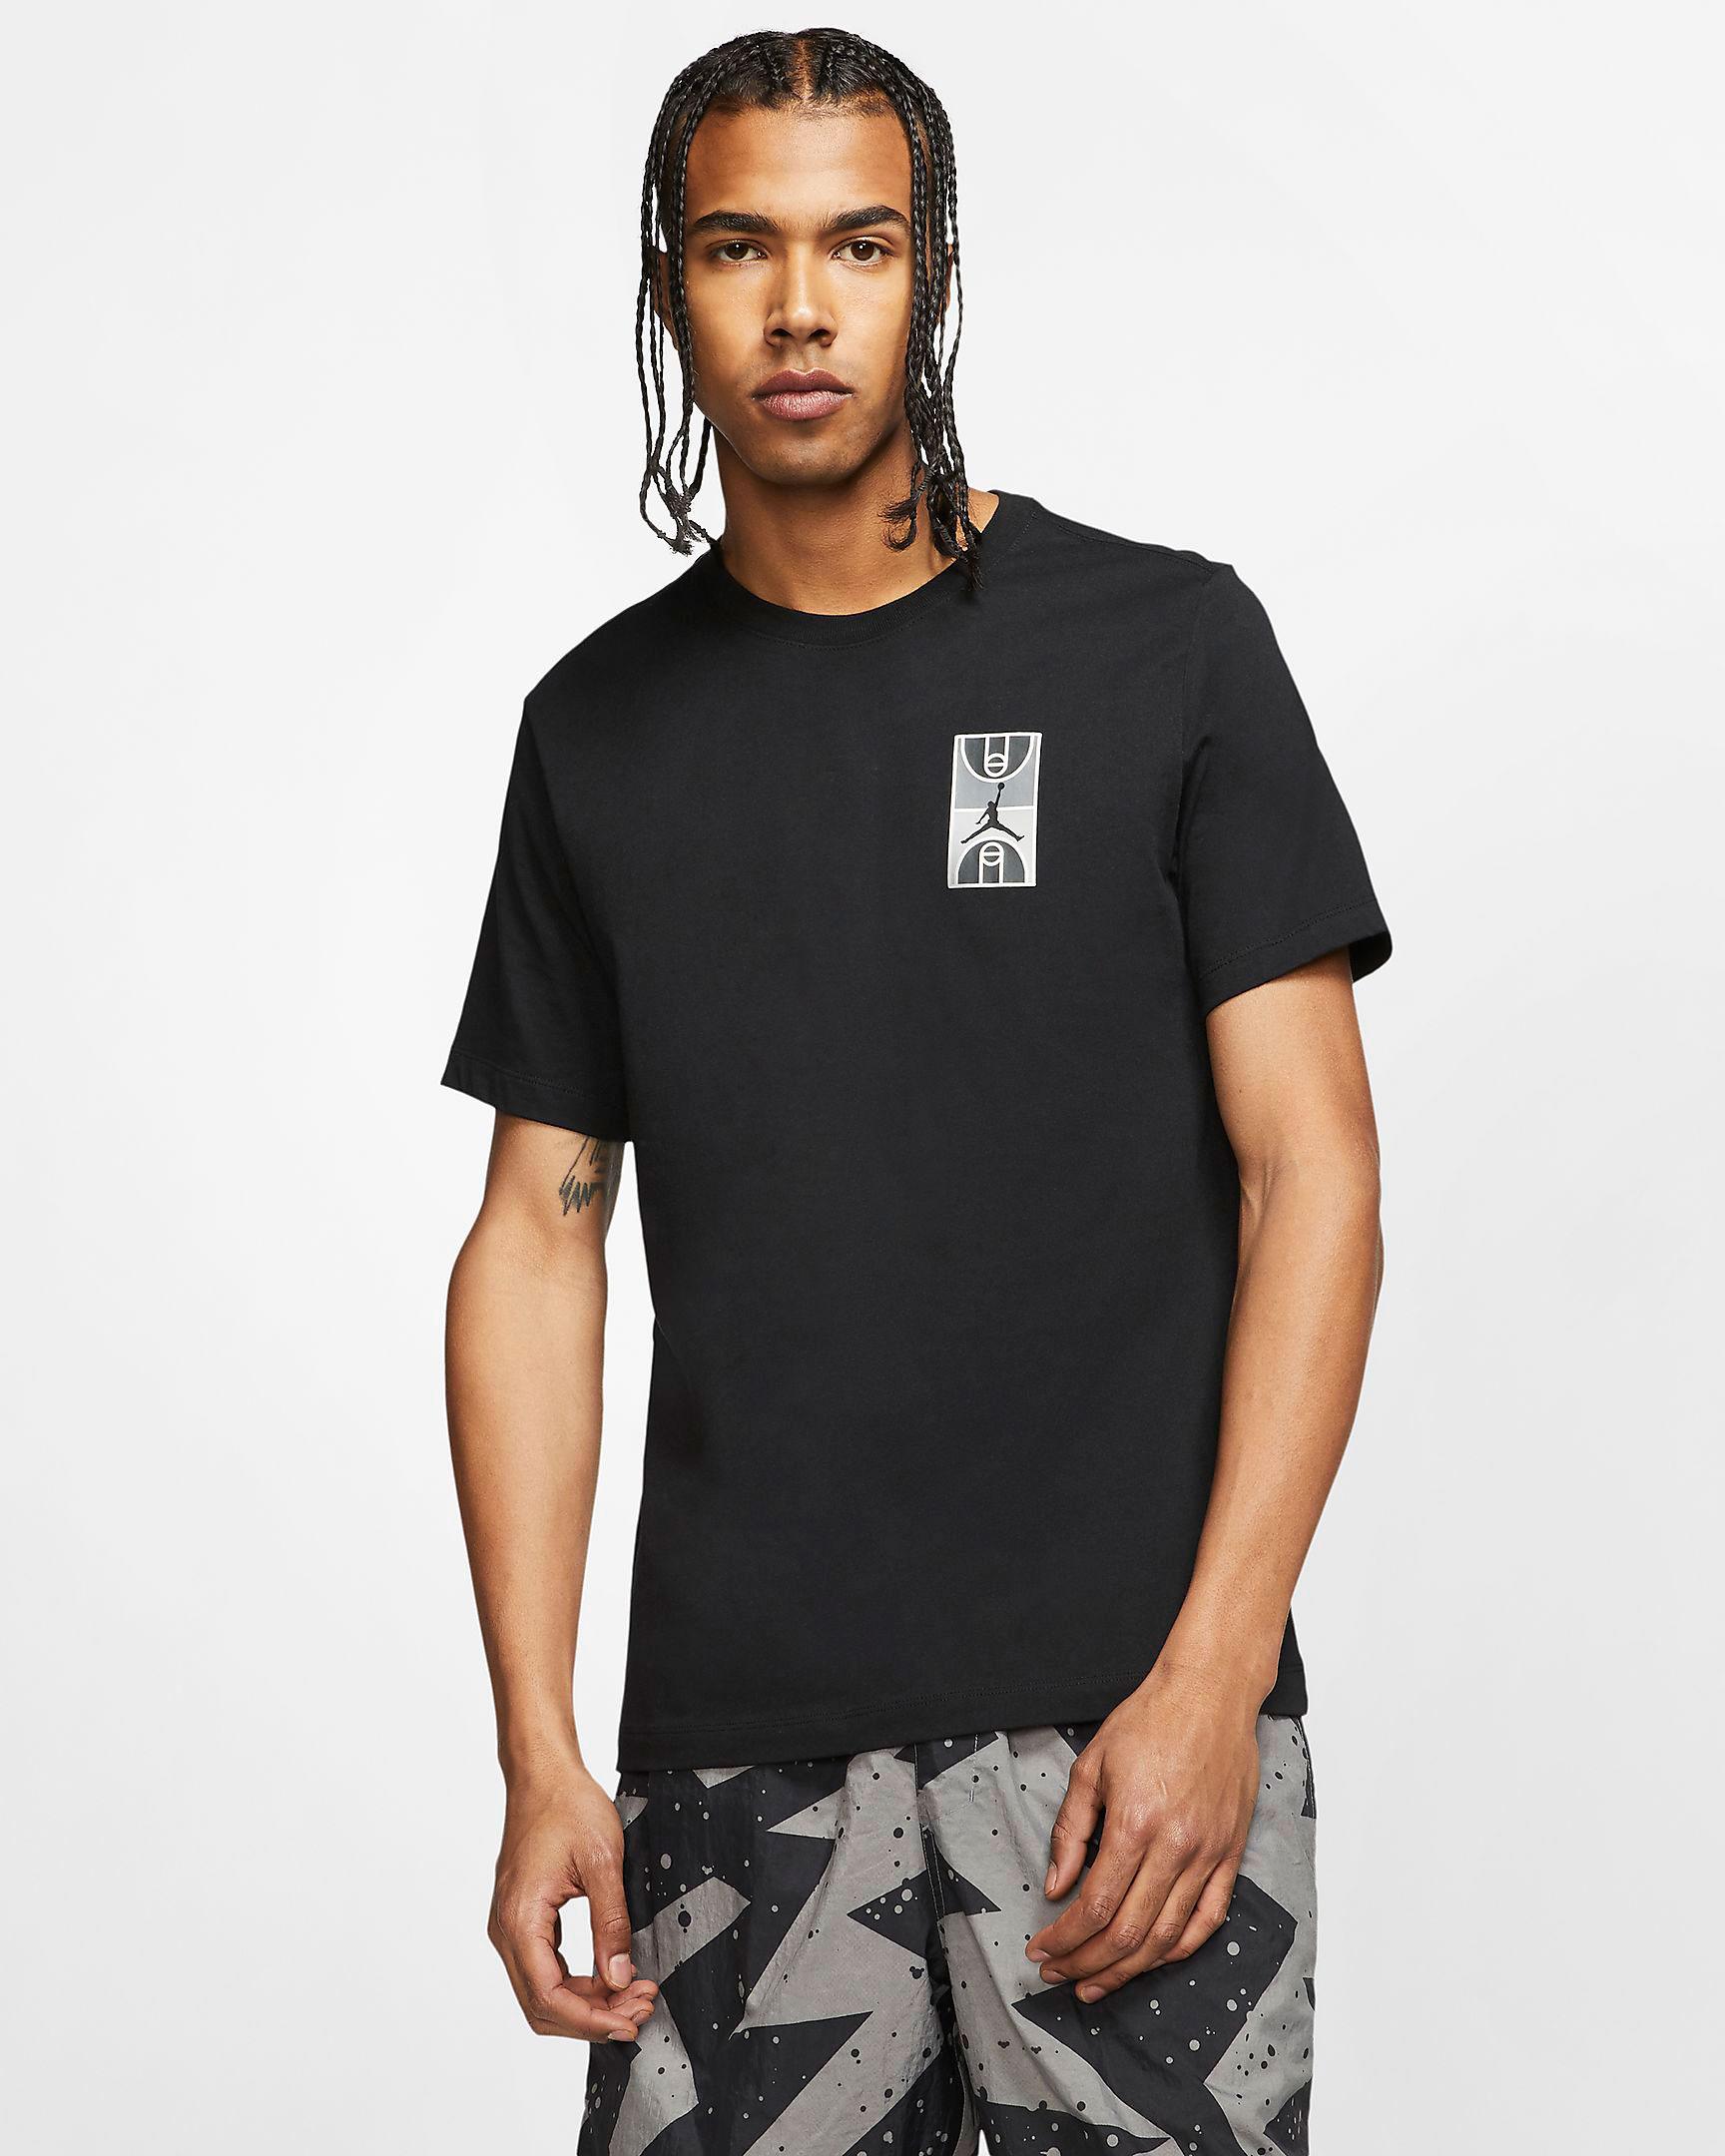 jordan-jumpman-graphic-court-tee-shirt-black-1